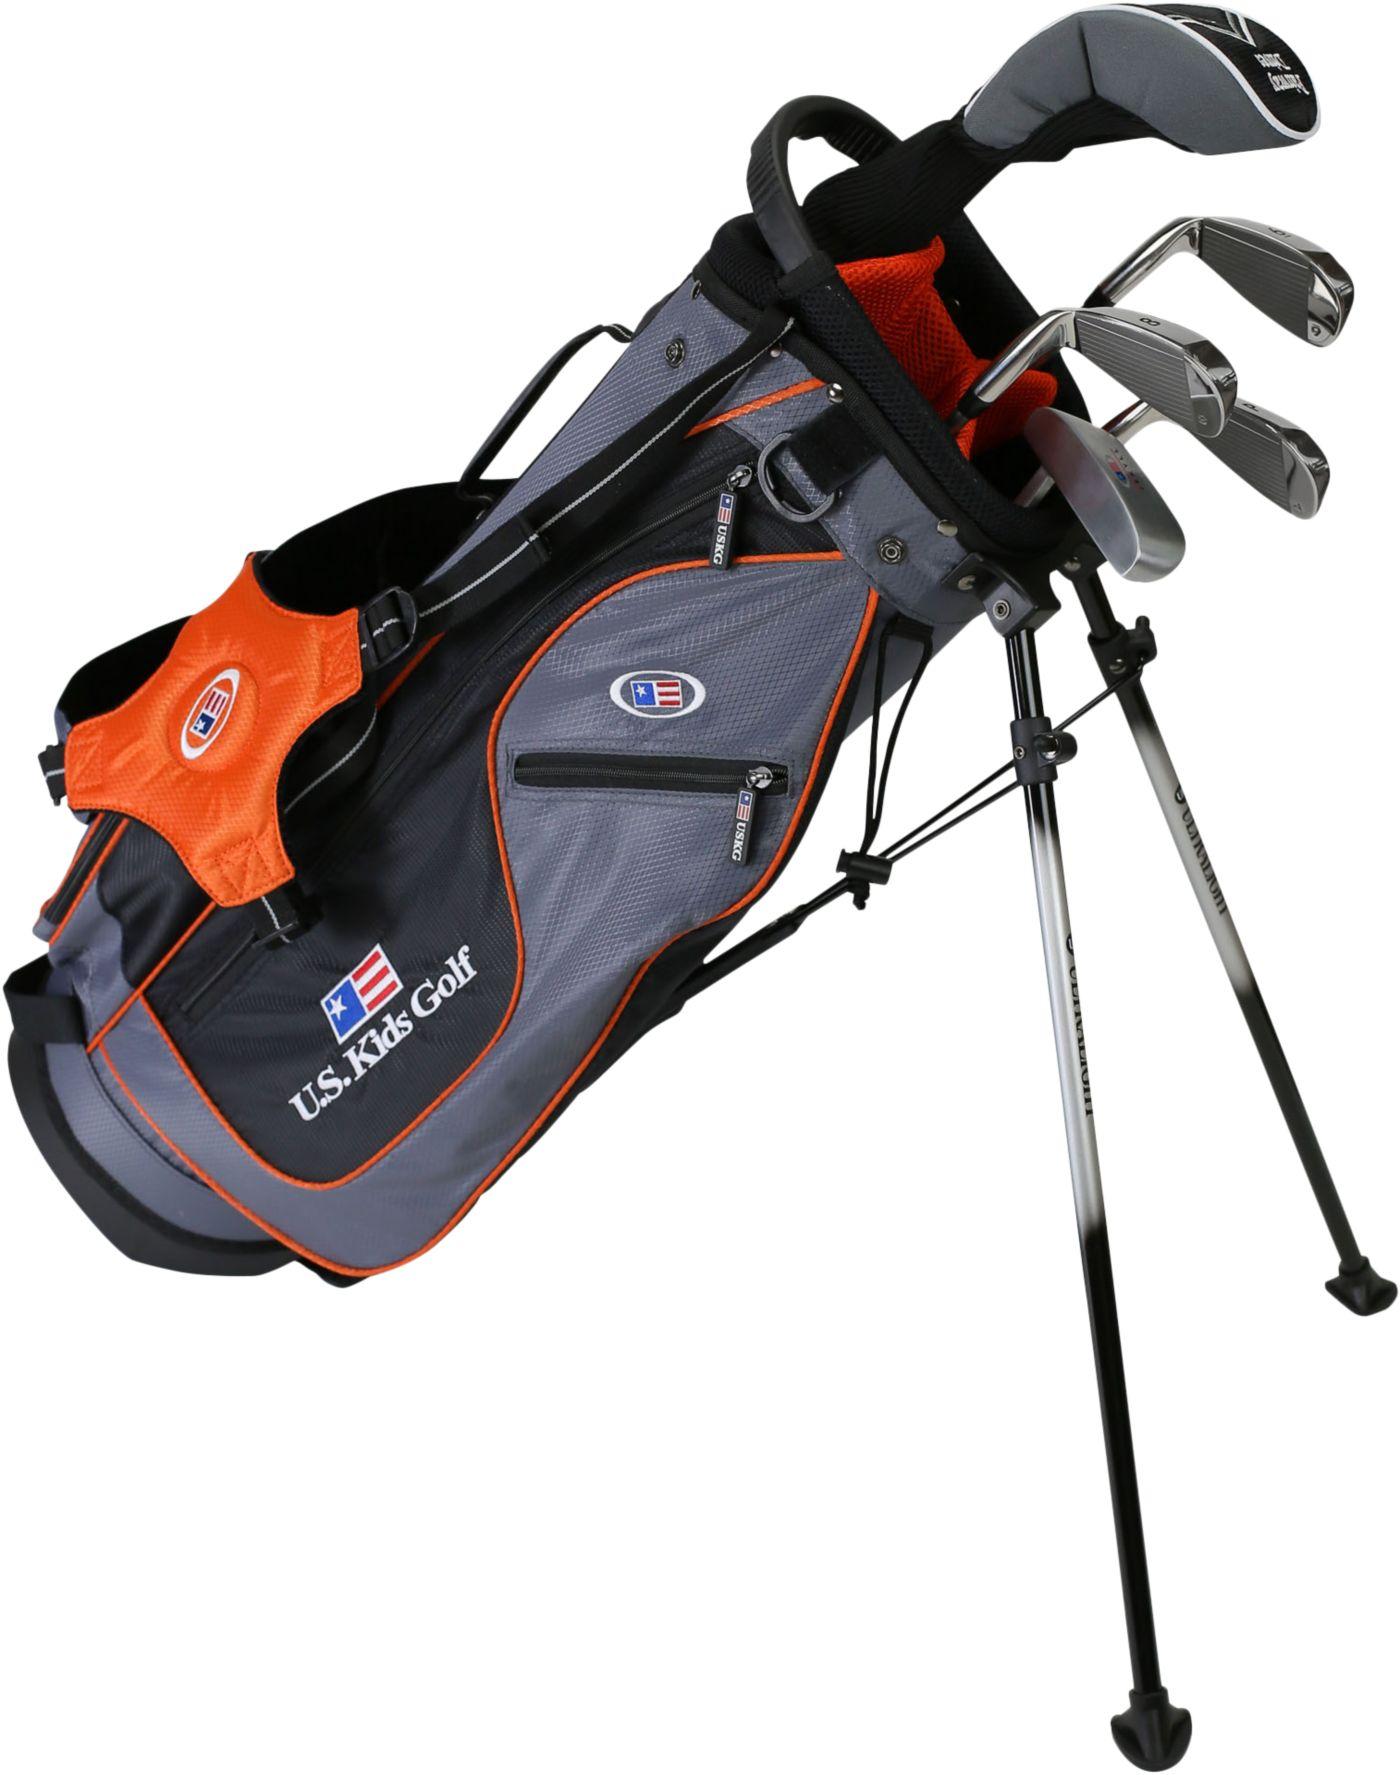 U.S. Kids Golf Kids' Ultralight Complete Set (Ages 7-9)